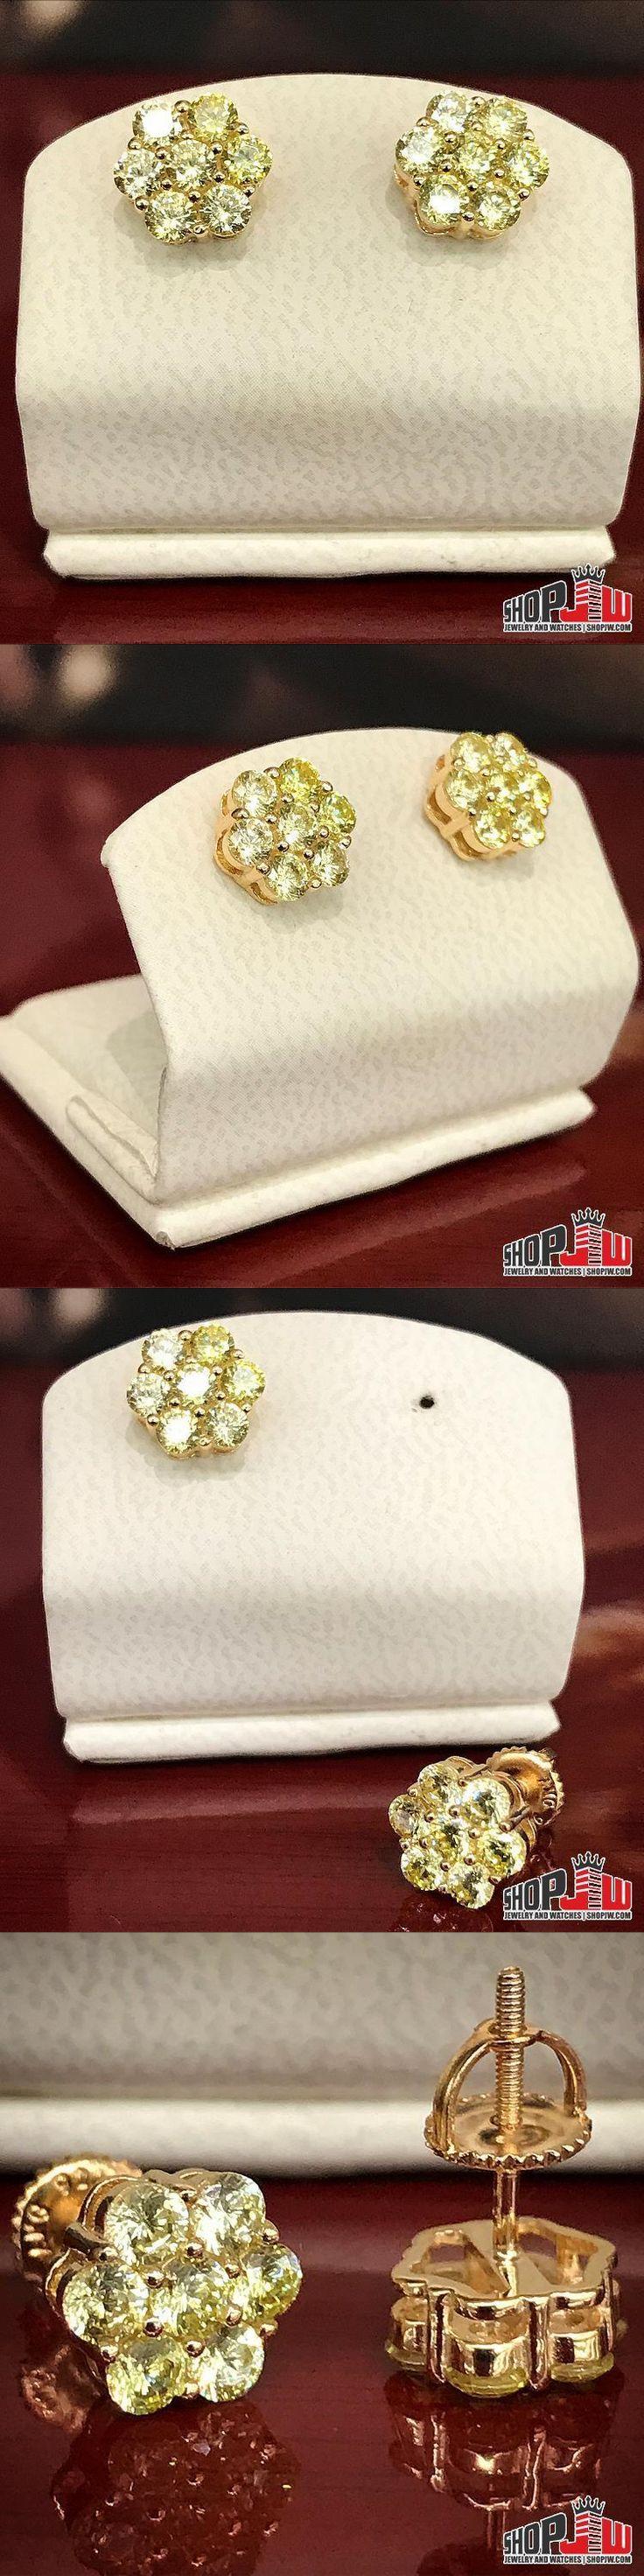 Earrings Studs 14085: Mens 14K Yellow Gold Finish .925 Silver Screw Back Earrings Cluster Lemonade New -> BUY IT NOW ONLY: $40 on eBay!